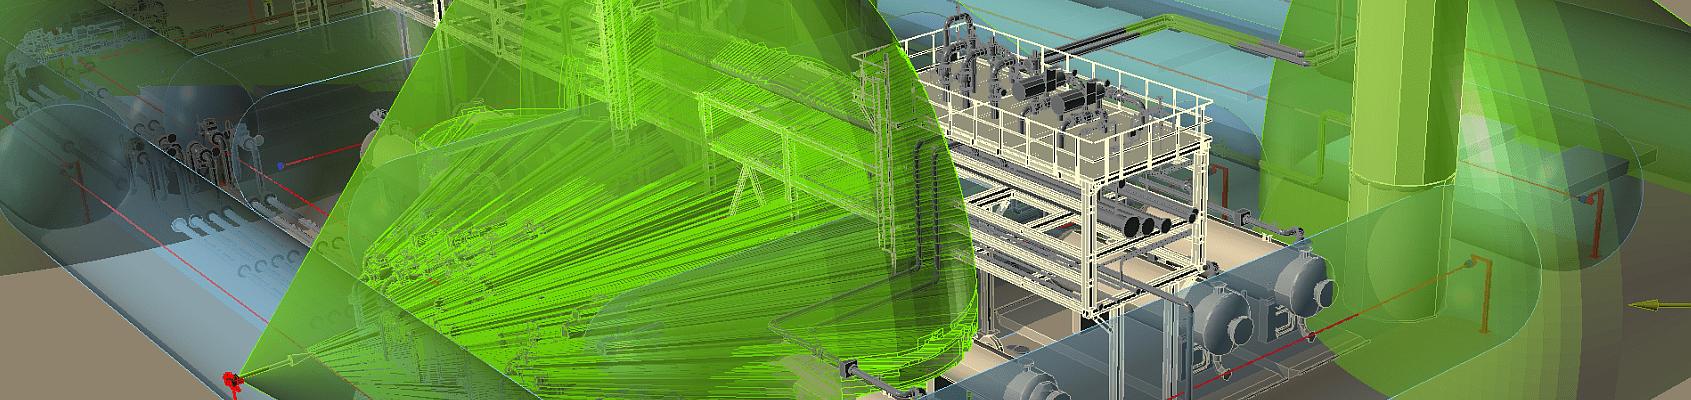 FD-Background-Detect3D